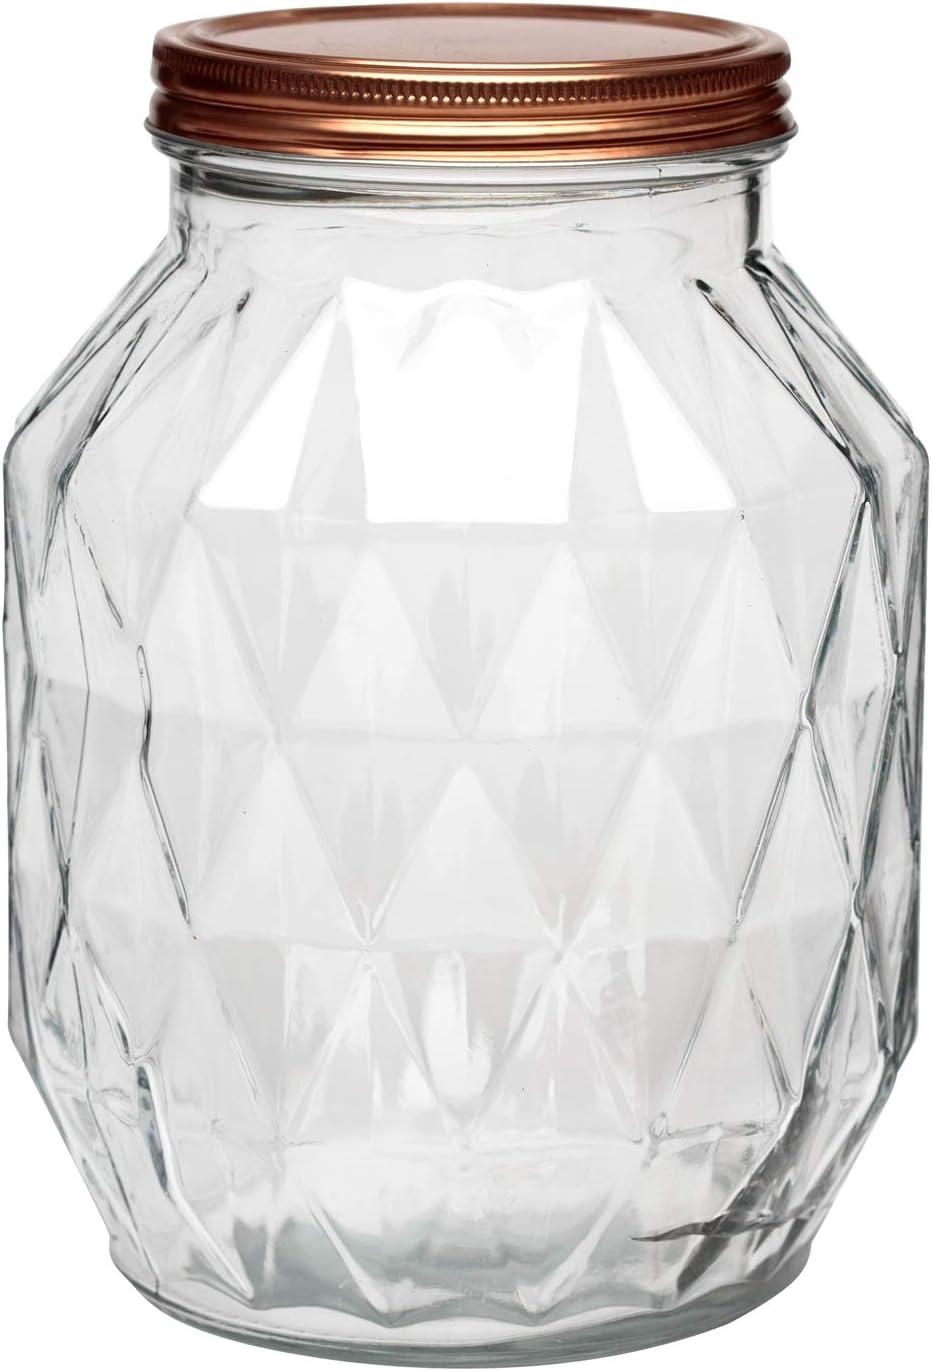 Amici Home Dakota Glass Canister, Large, Copper